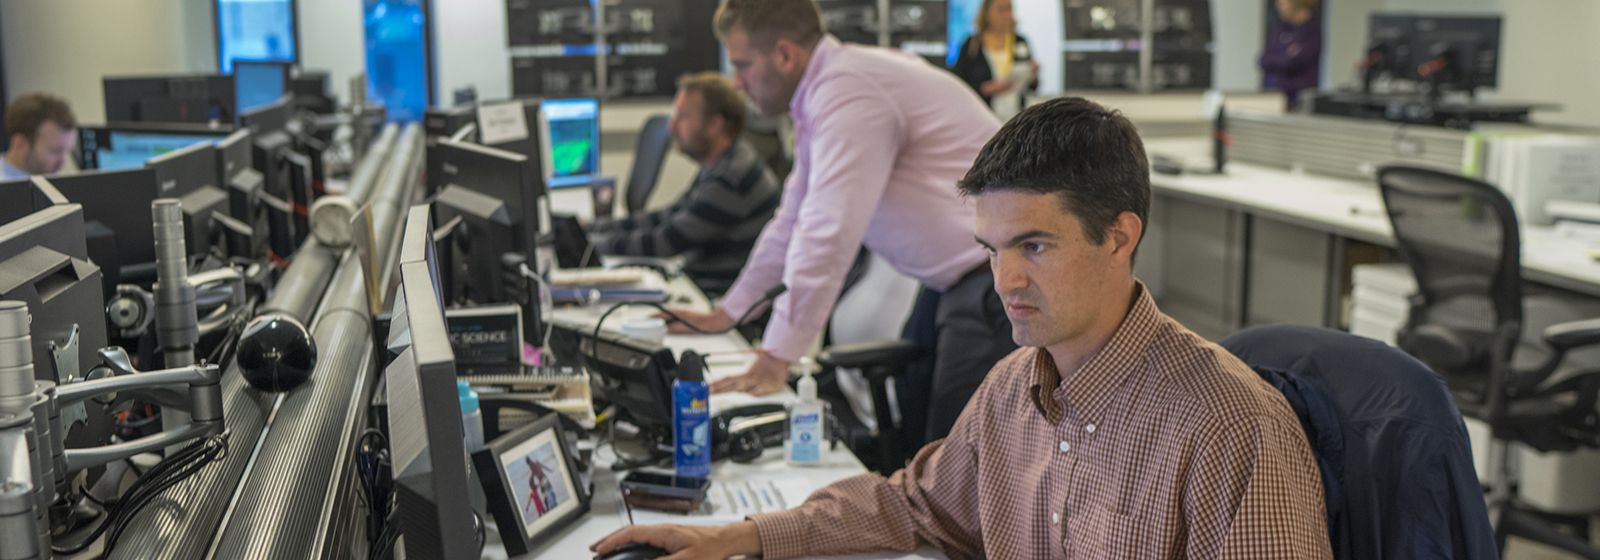 Forecast calls for above-average hurricane season